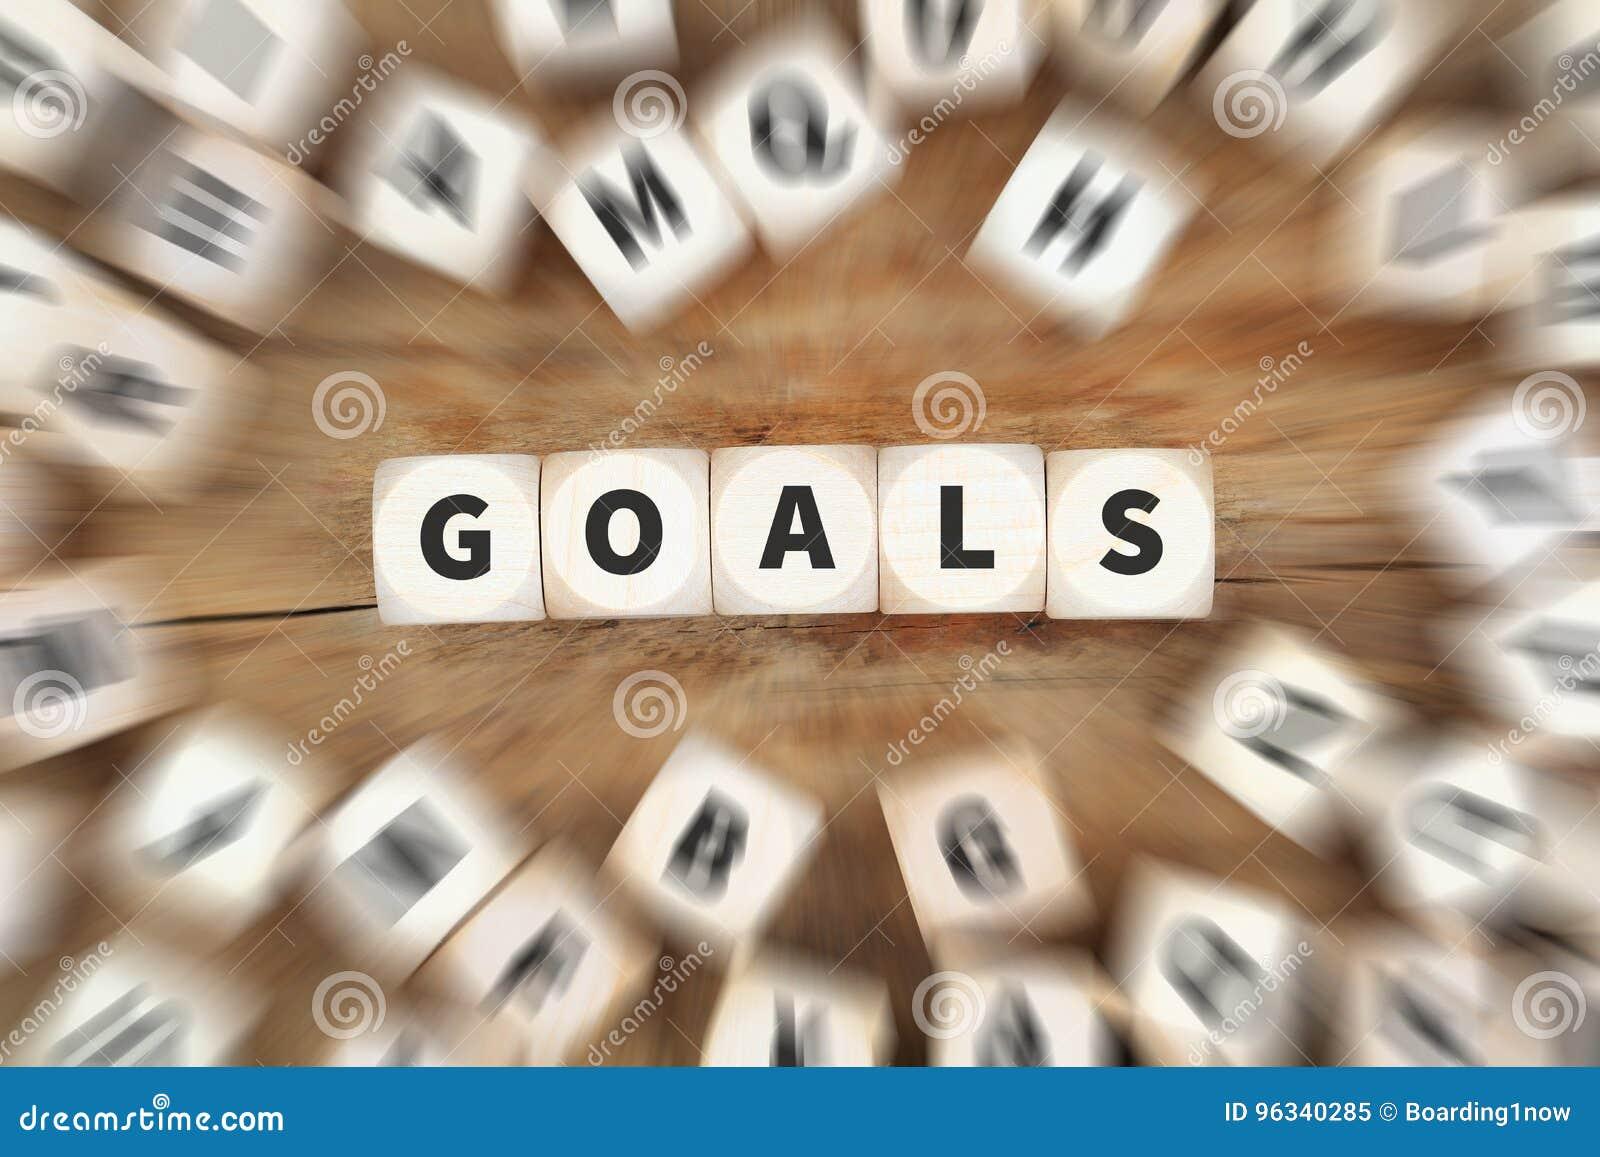 Goal goals setting success new aspirations strategy future dice